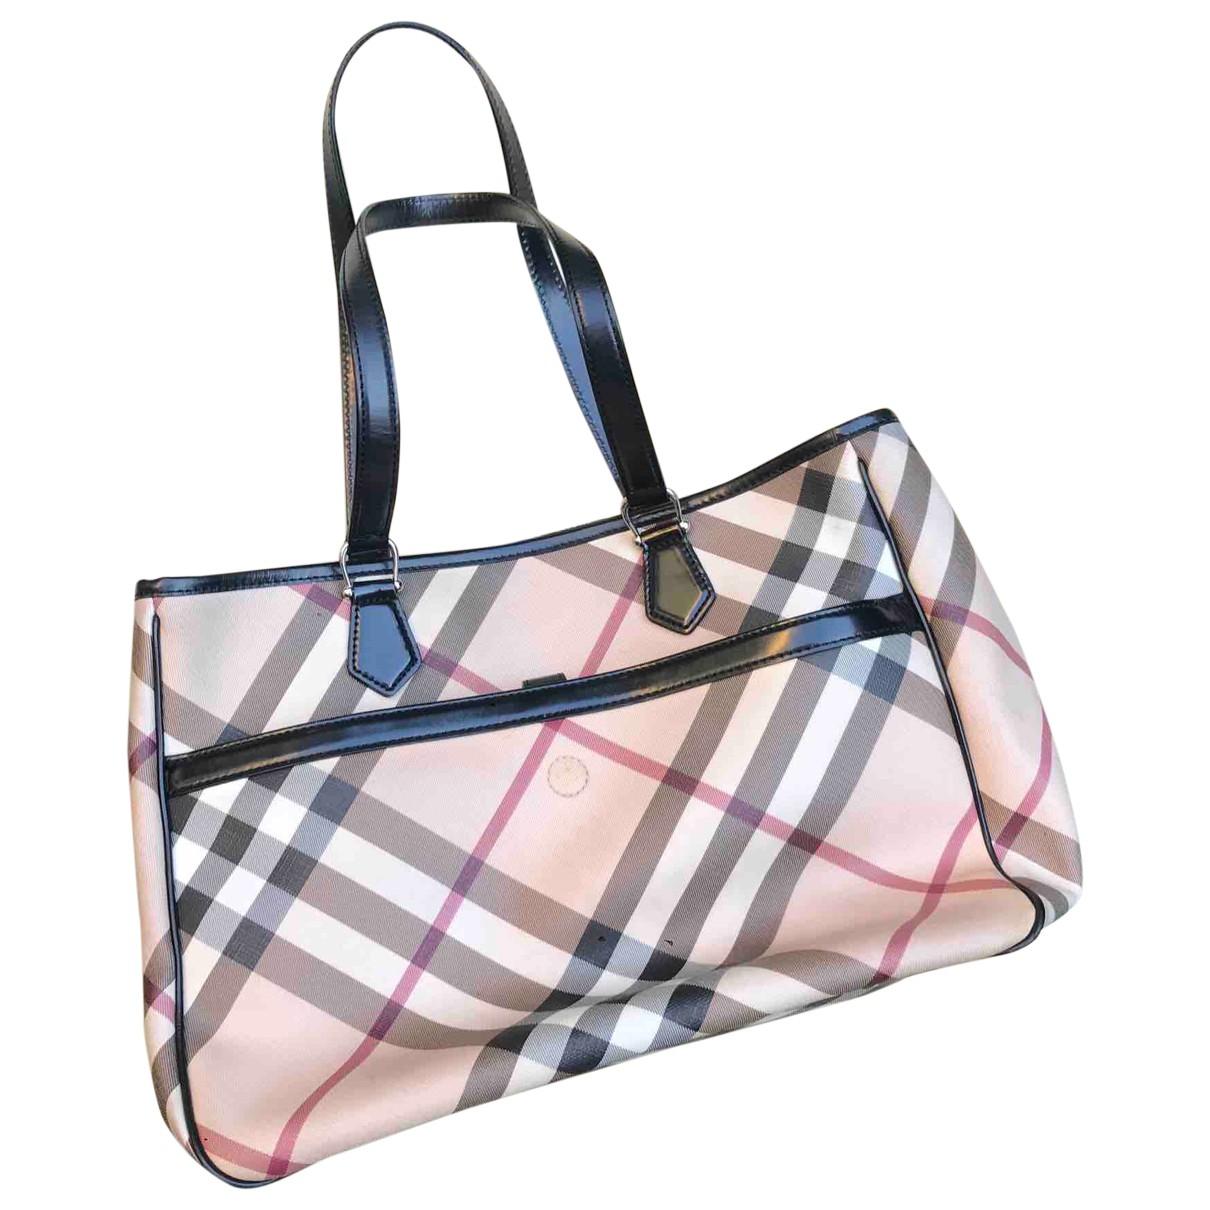 Burberry \N Handtasche in  Beige Lackleder